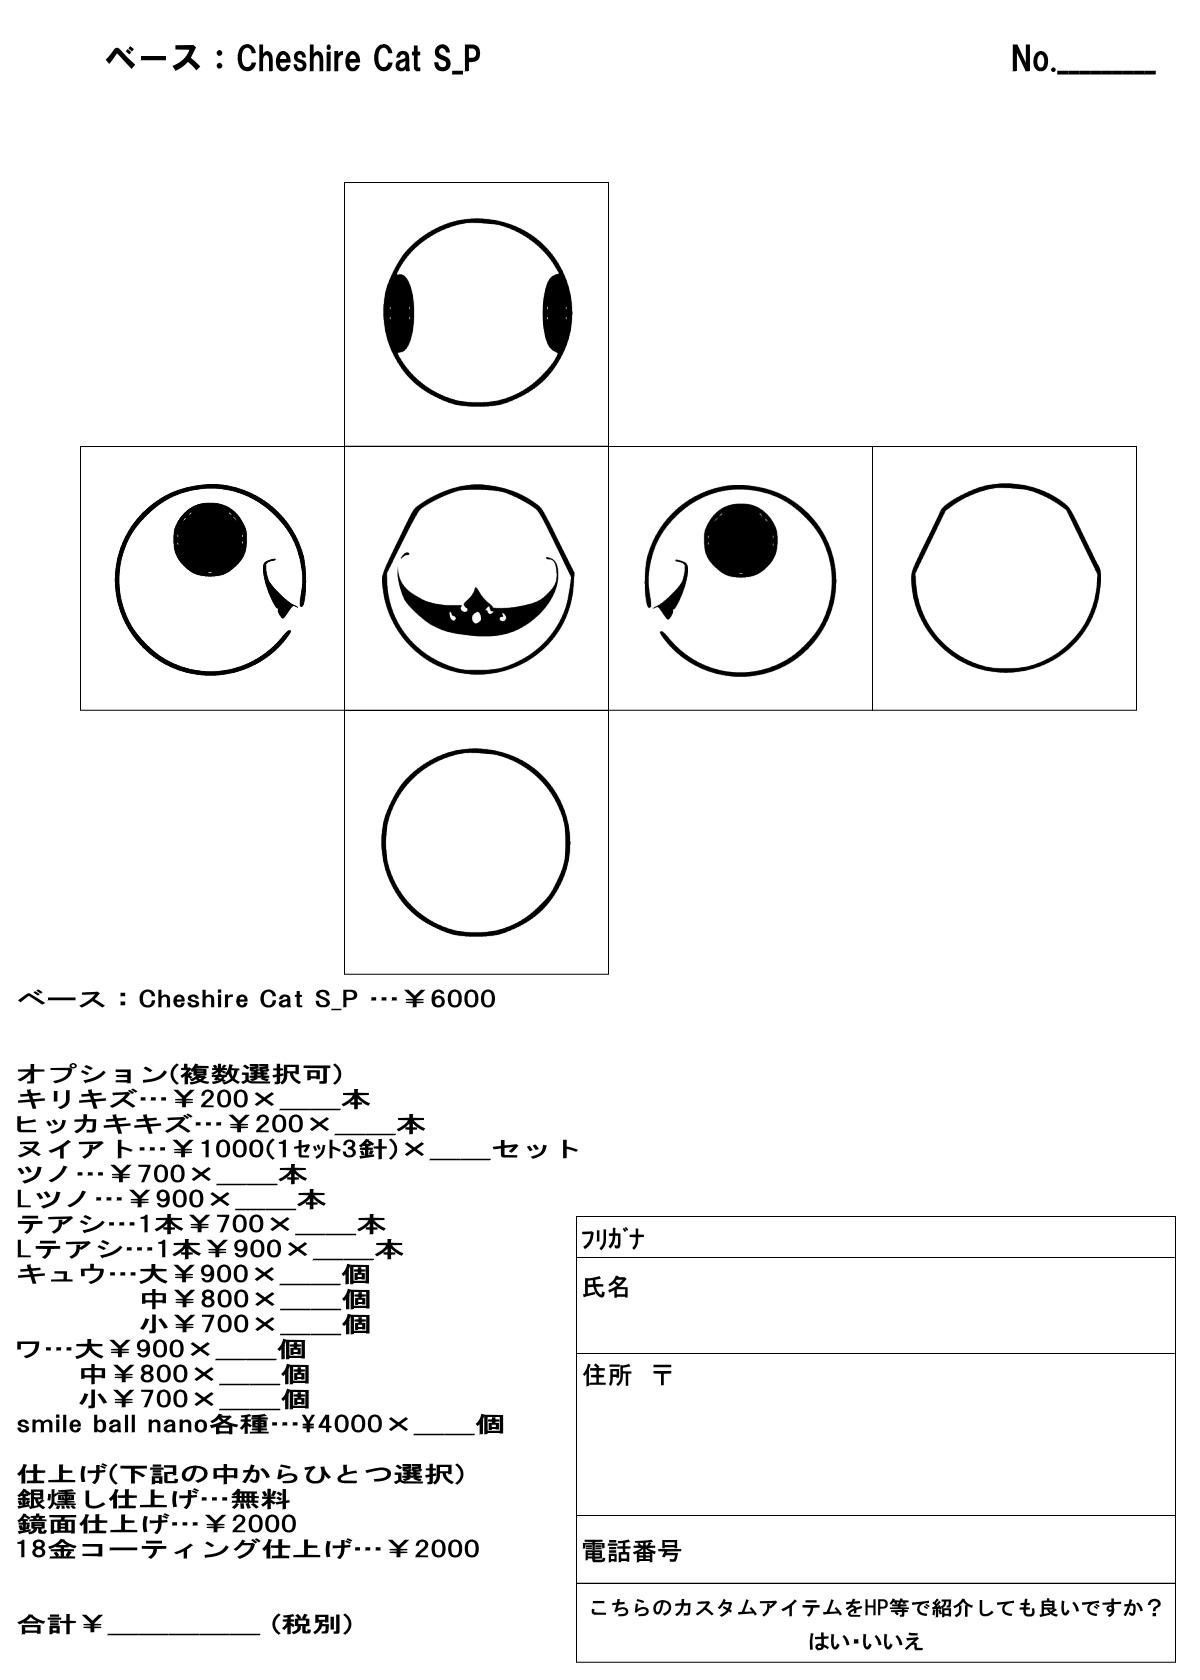 12/2smile_mammyカスタム受注イベント詳細。_d0014014_23143051.jpg